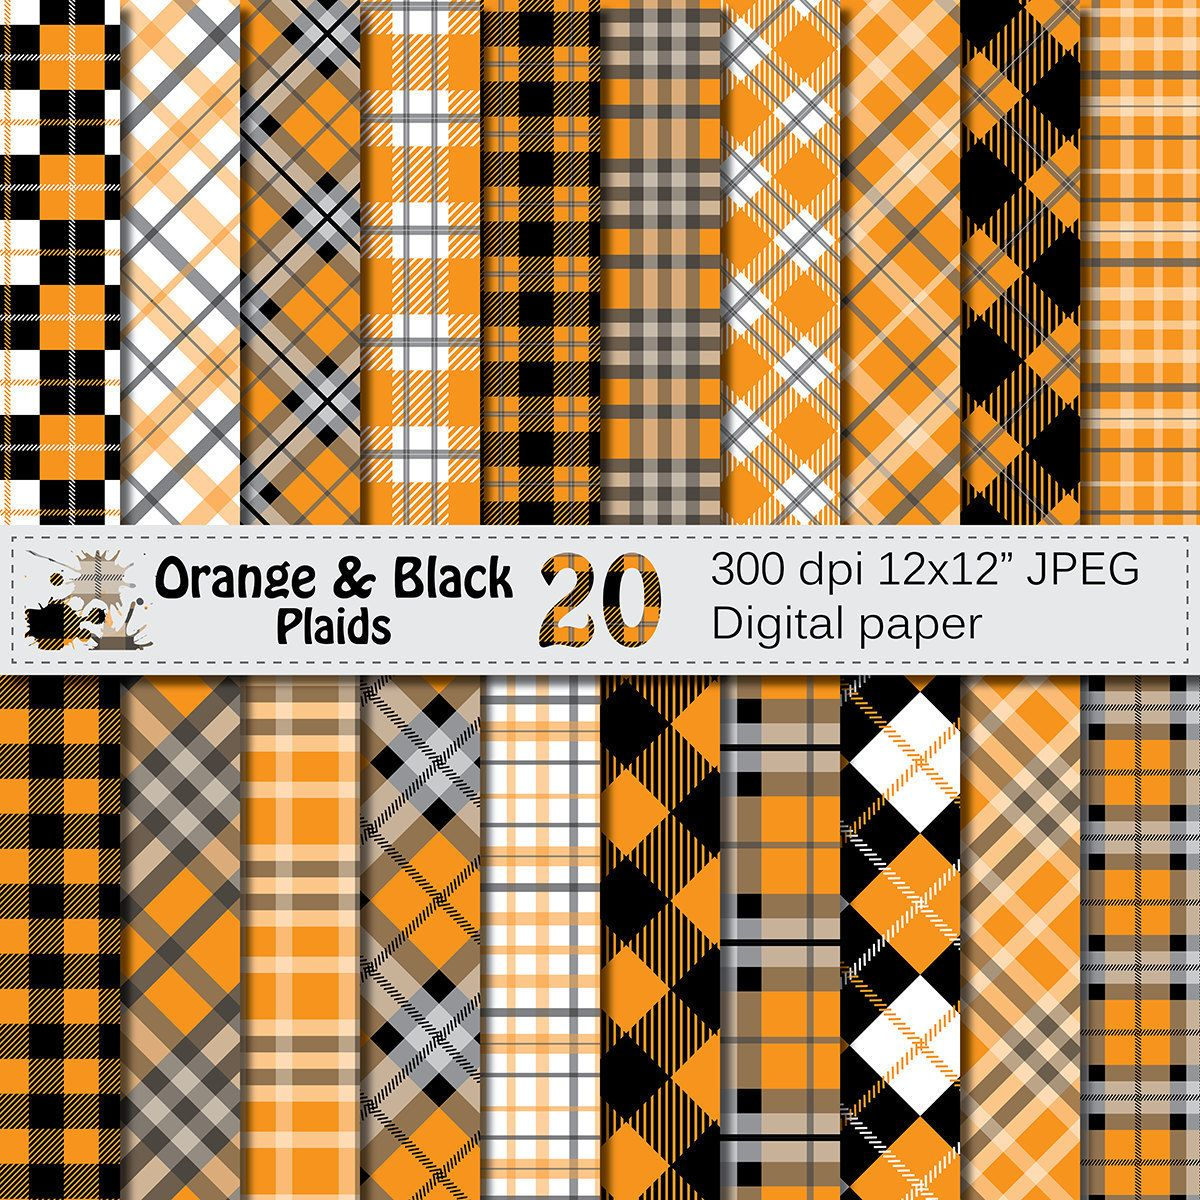 Scrapbook paper etsy - Orange And Black Plaids Digital Paper Buffalo Plaid Lumberjack Check Digital Papers Black Orange Geometric Scrapbook Paper Download